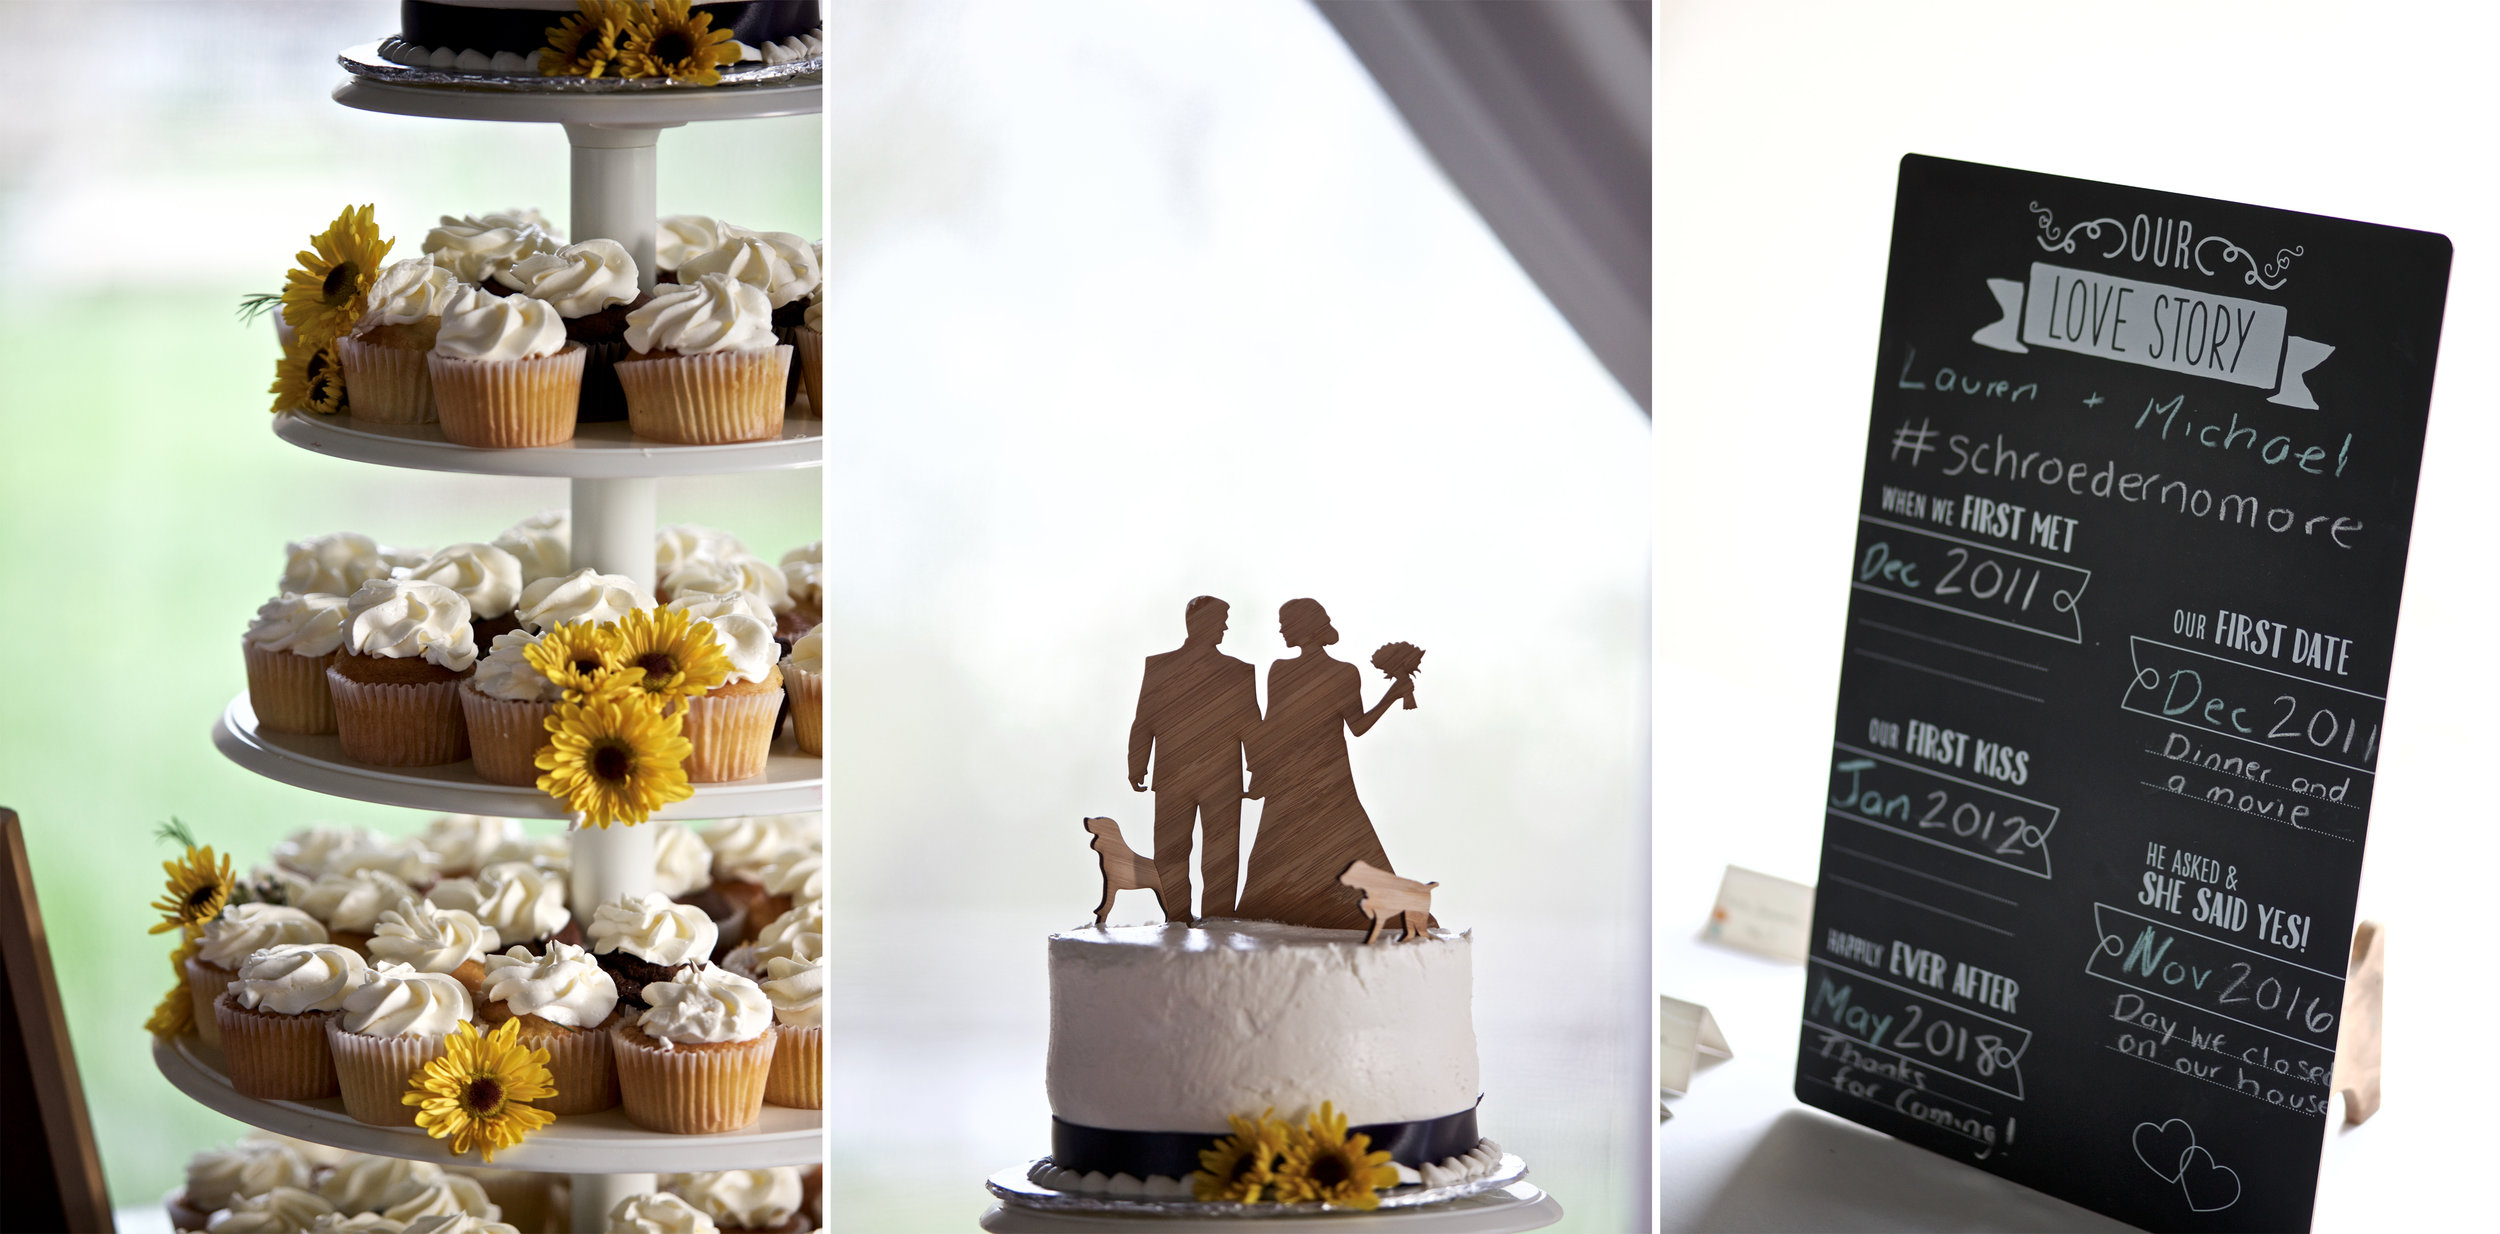 Lippincott manor wedding, wallkill ny wedding, photography, photographer, photos o.jpg